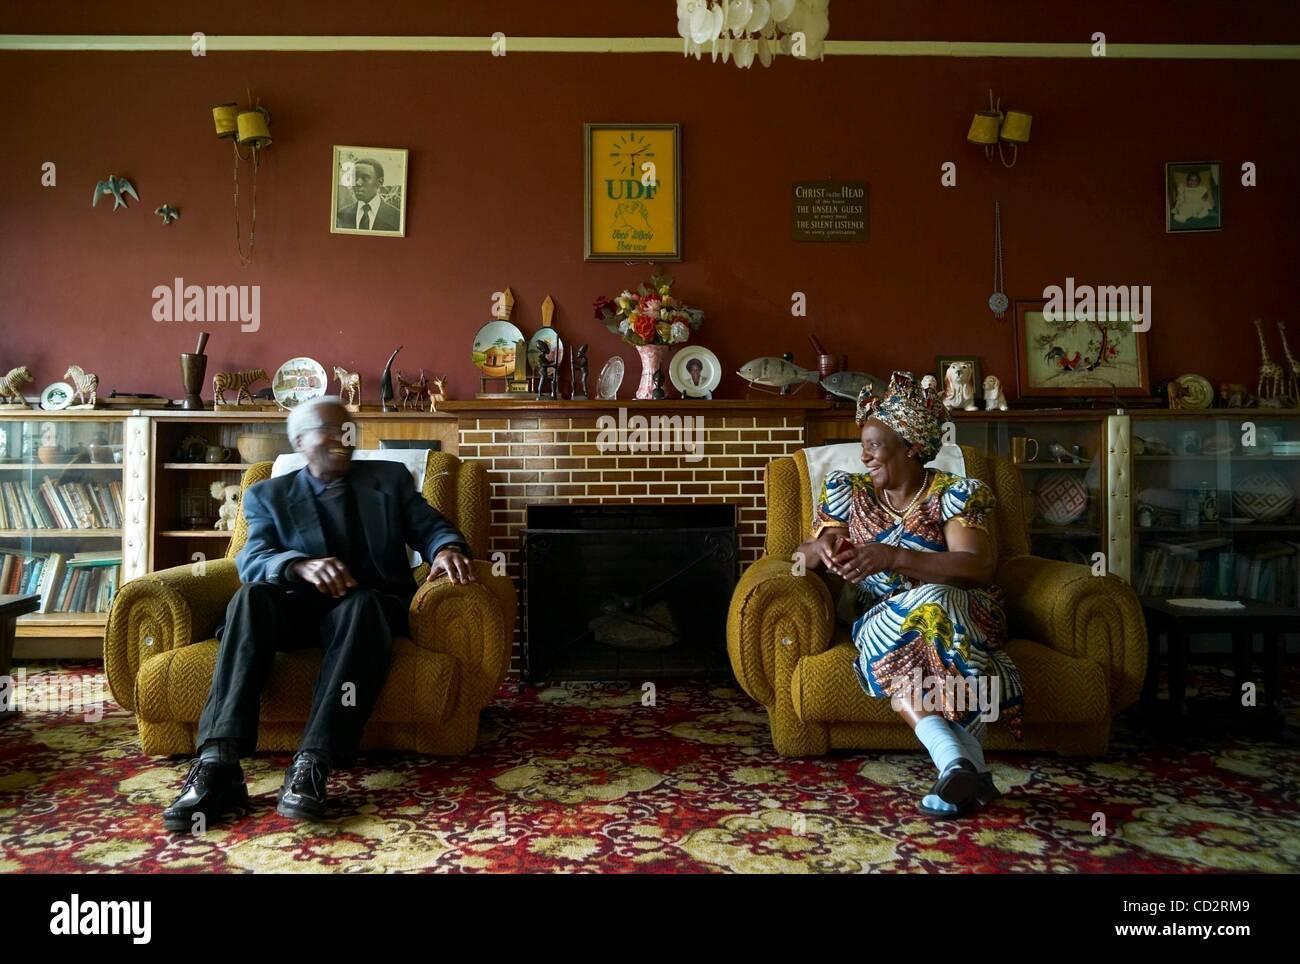 Mar 19, 2008 - Lilongwe, Malawi - EDDA CHITALO and husband. Chitalo has vast experience in politics, having worked - Stock Image